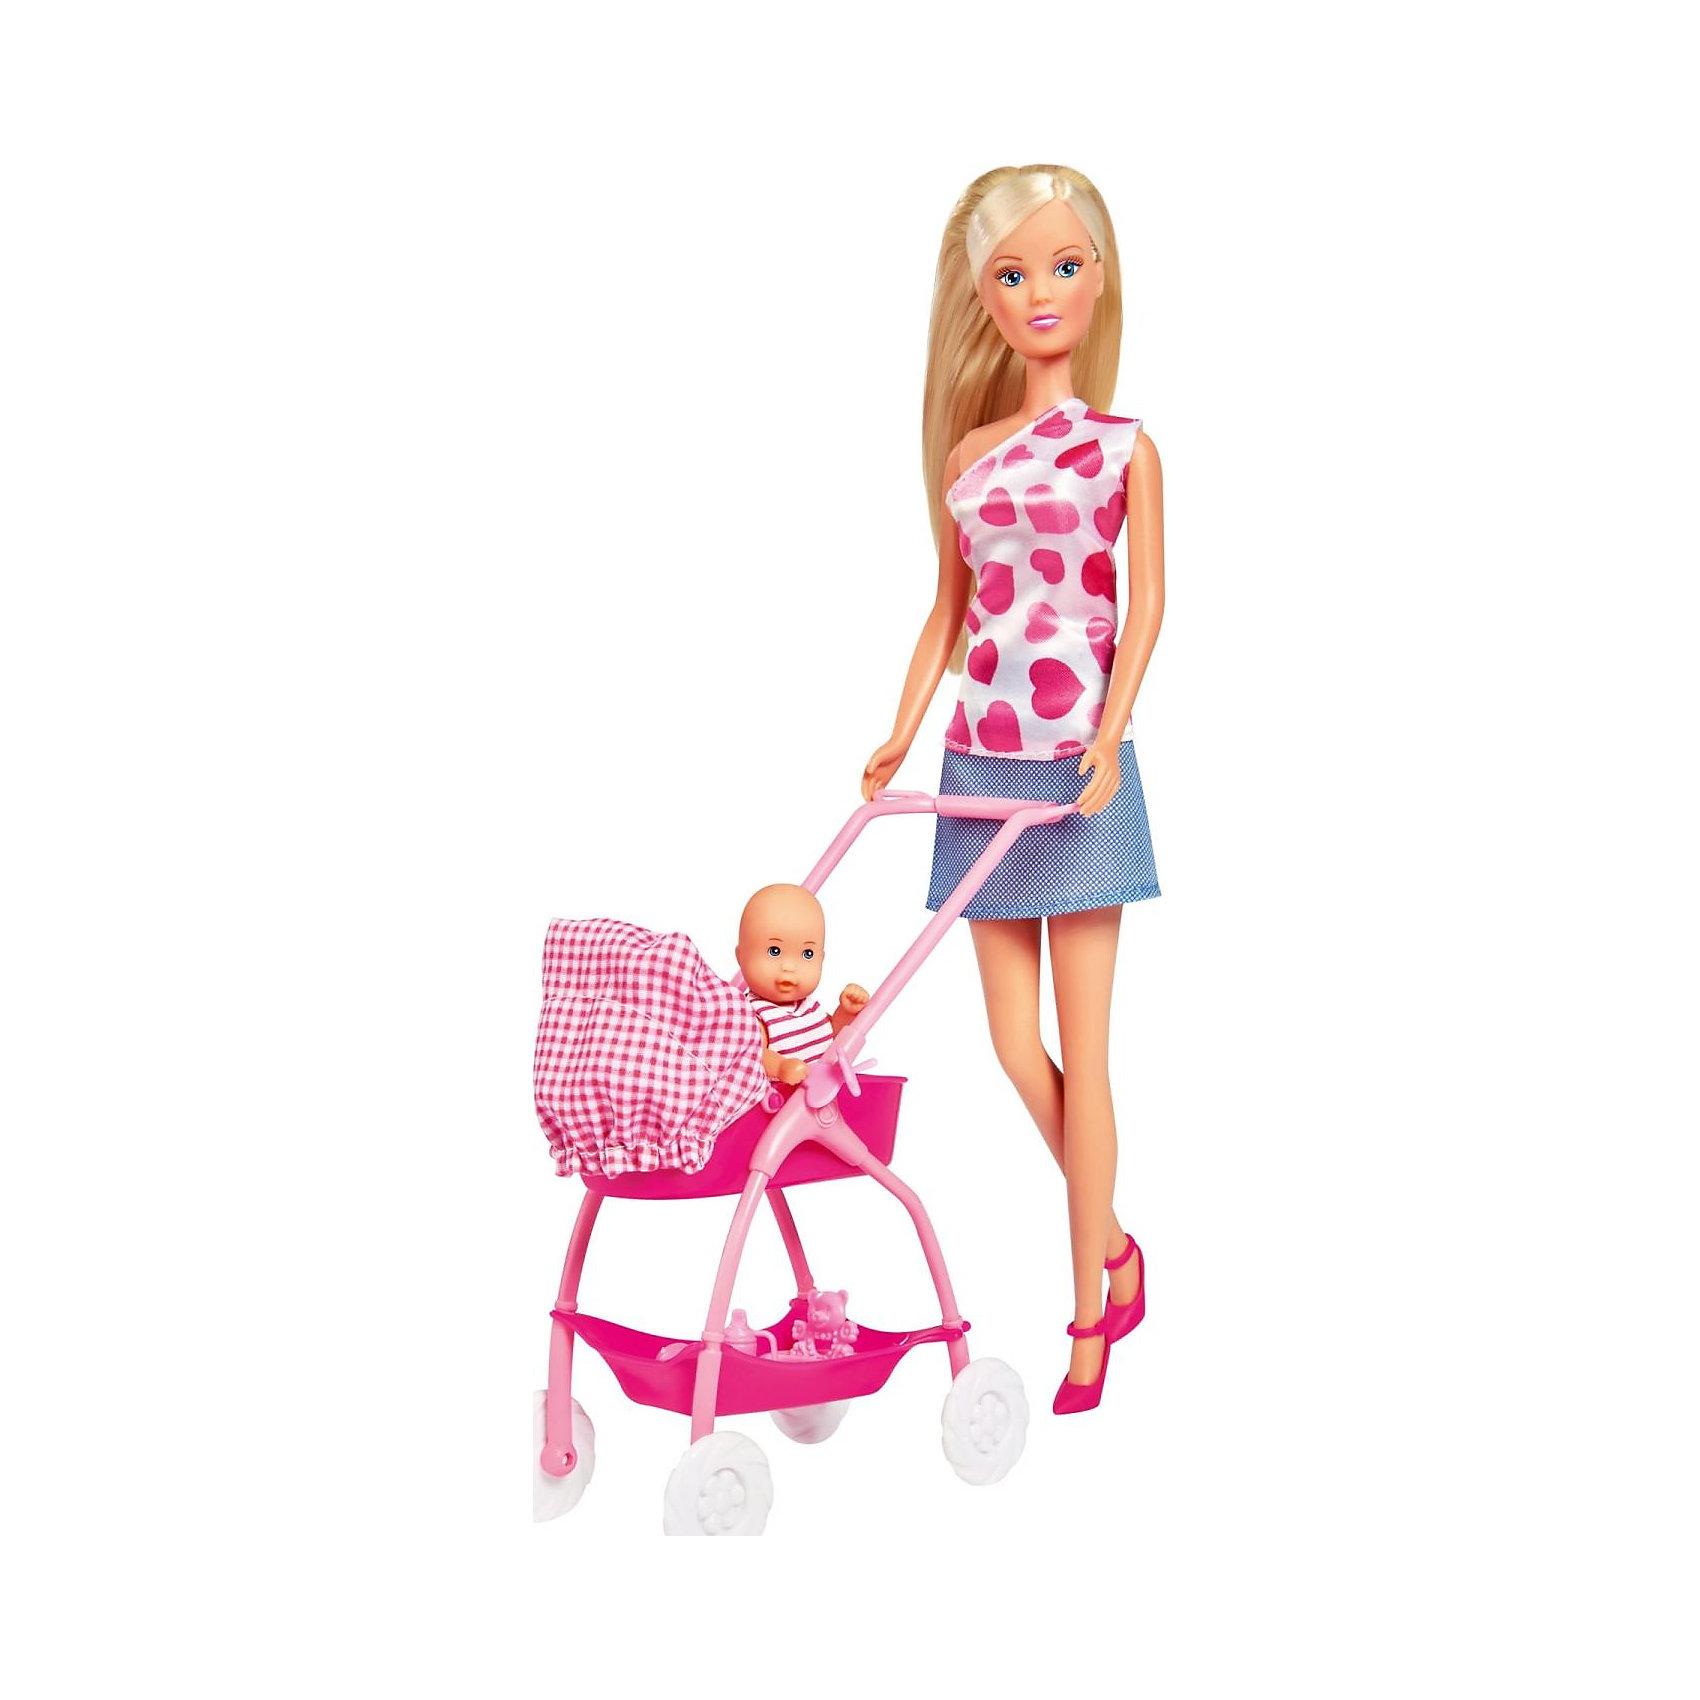 Кукла Штеффи с новорожденным, SimbaБренды кукол<br>Комплект: кукла Штеффи, пупс, коляска, ванночка, весы, мебель.<br><br>Ширина мм: 330<br>Глубина мм: 100<br>Высота мм: 400<br>Вес г: 700<br>Возраст от месяцев: 36<br>Возраст до месяцев: 84<br>Пол: Женский<br>Возраст: Детский<br>SKU: 2149313